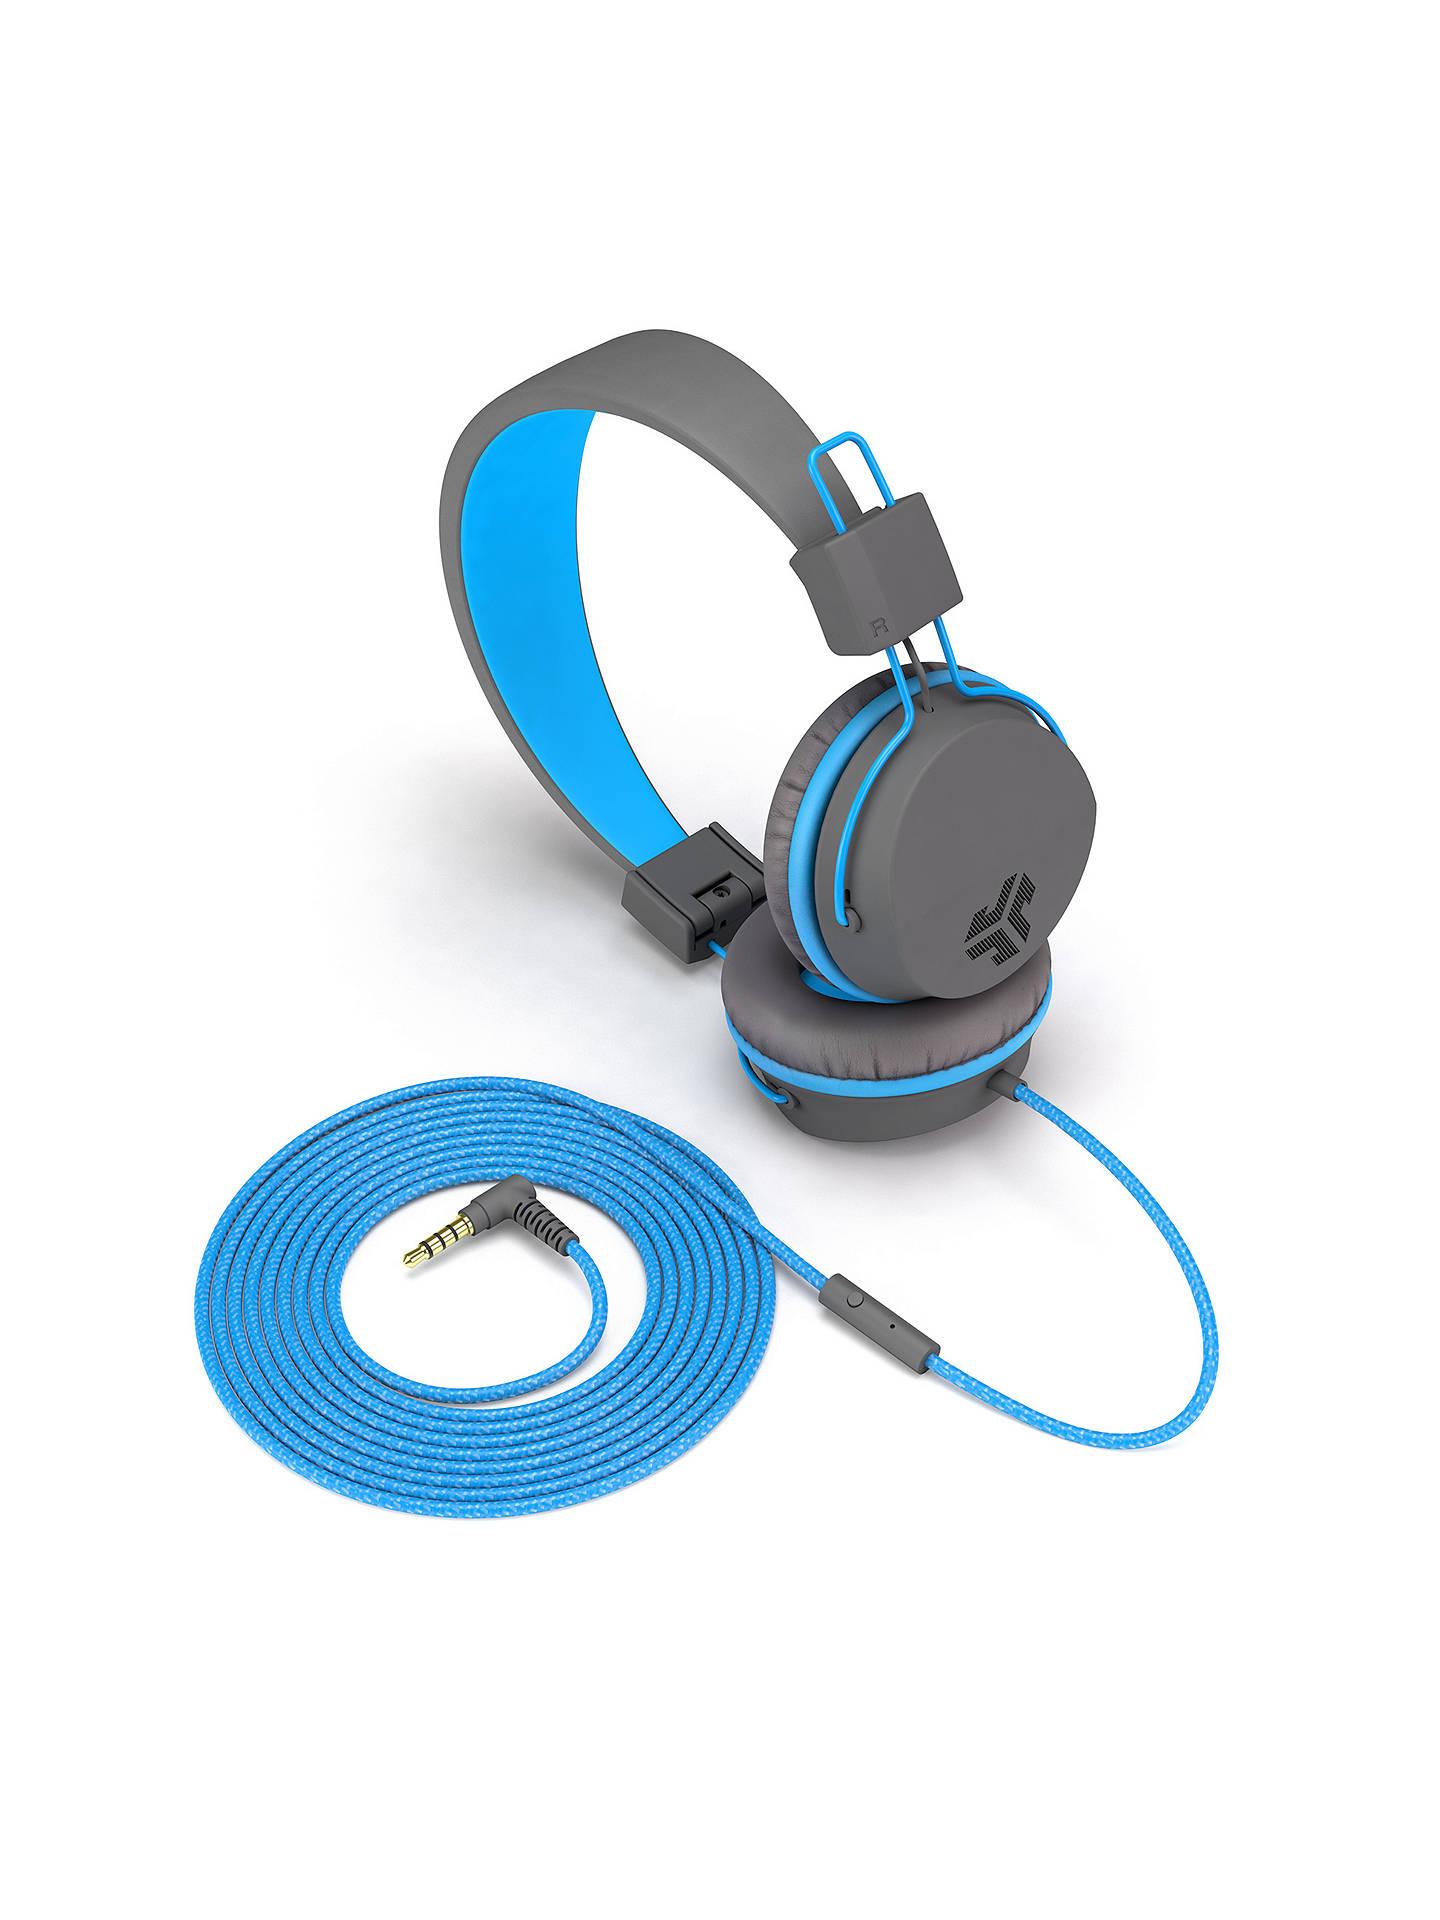 d930b306f86 ... Buy JLab Audio JBuddies Studio Children's Volume Limiting Over-Ear  Headphones with Mic/Remote